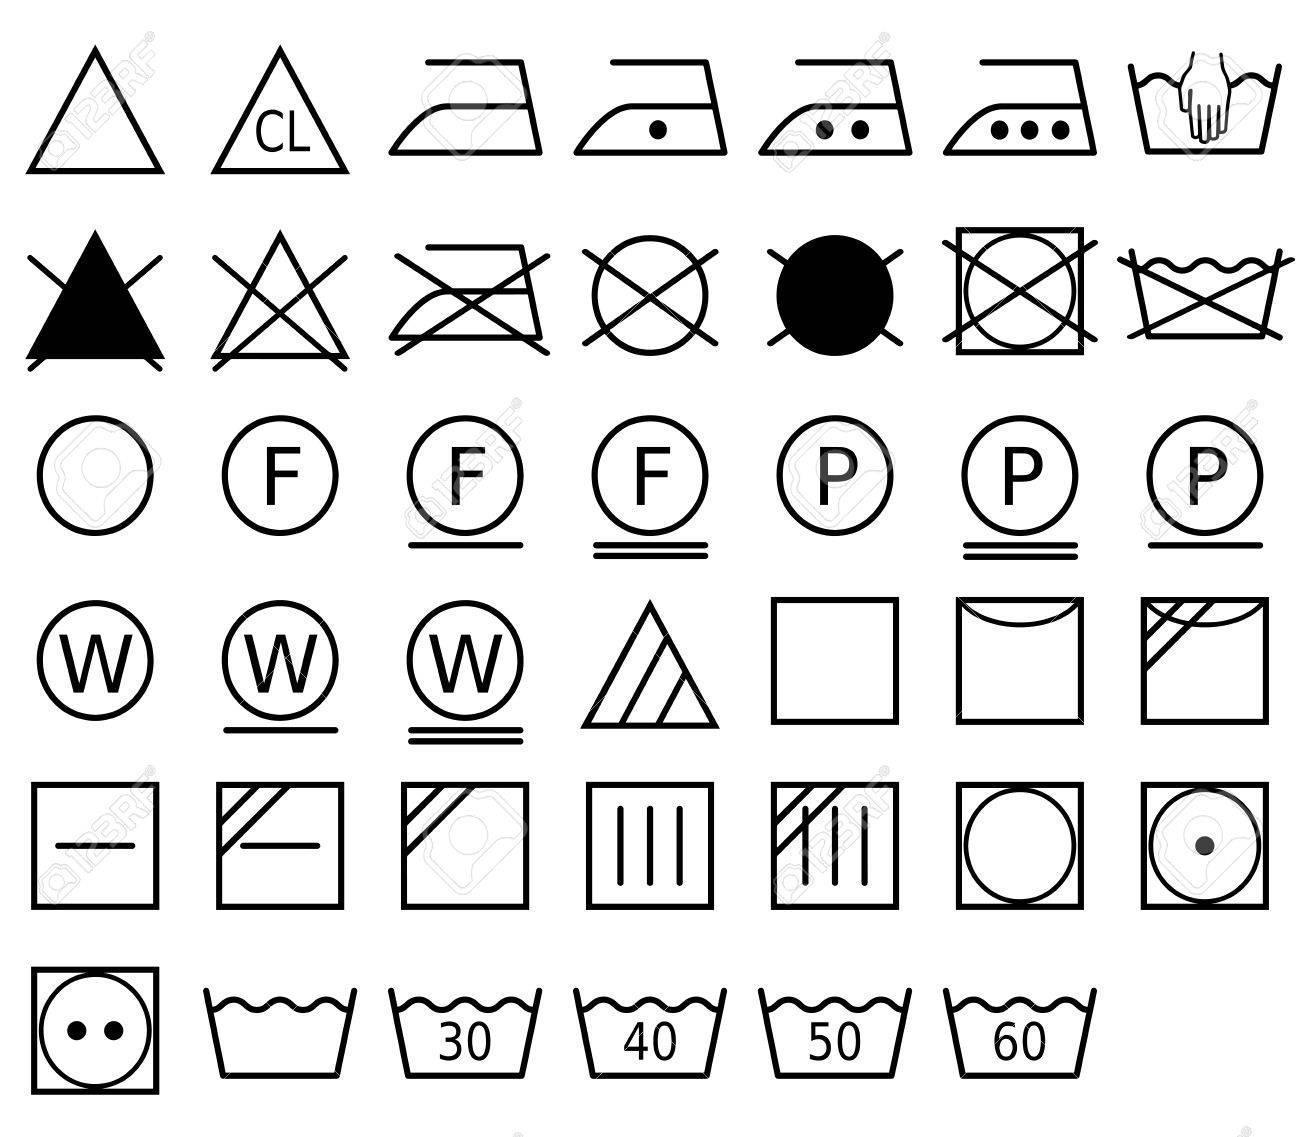 International Laundry Care Symbols Learn The International Laundry